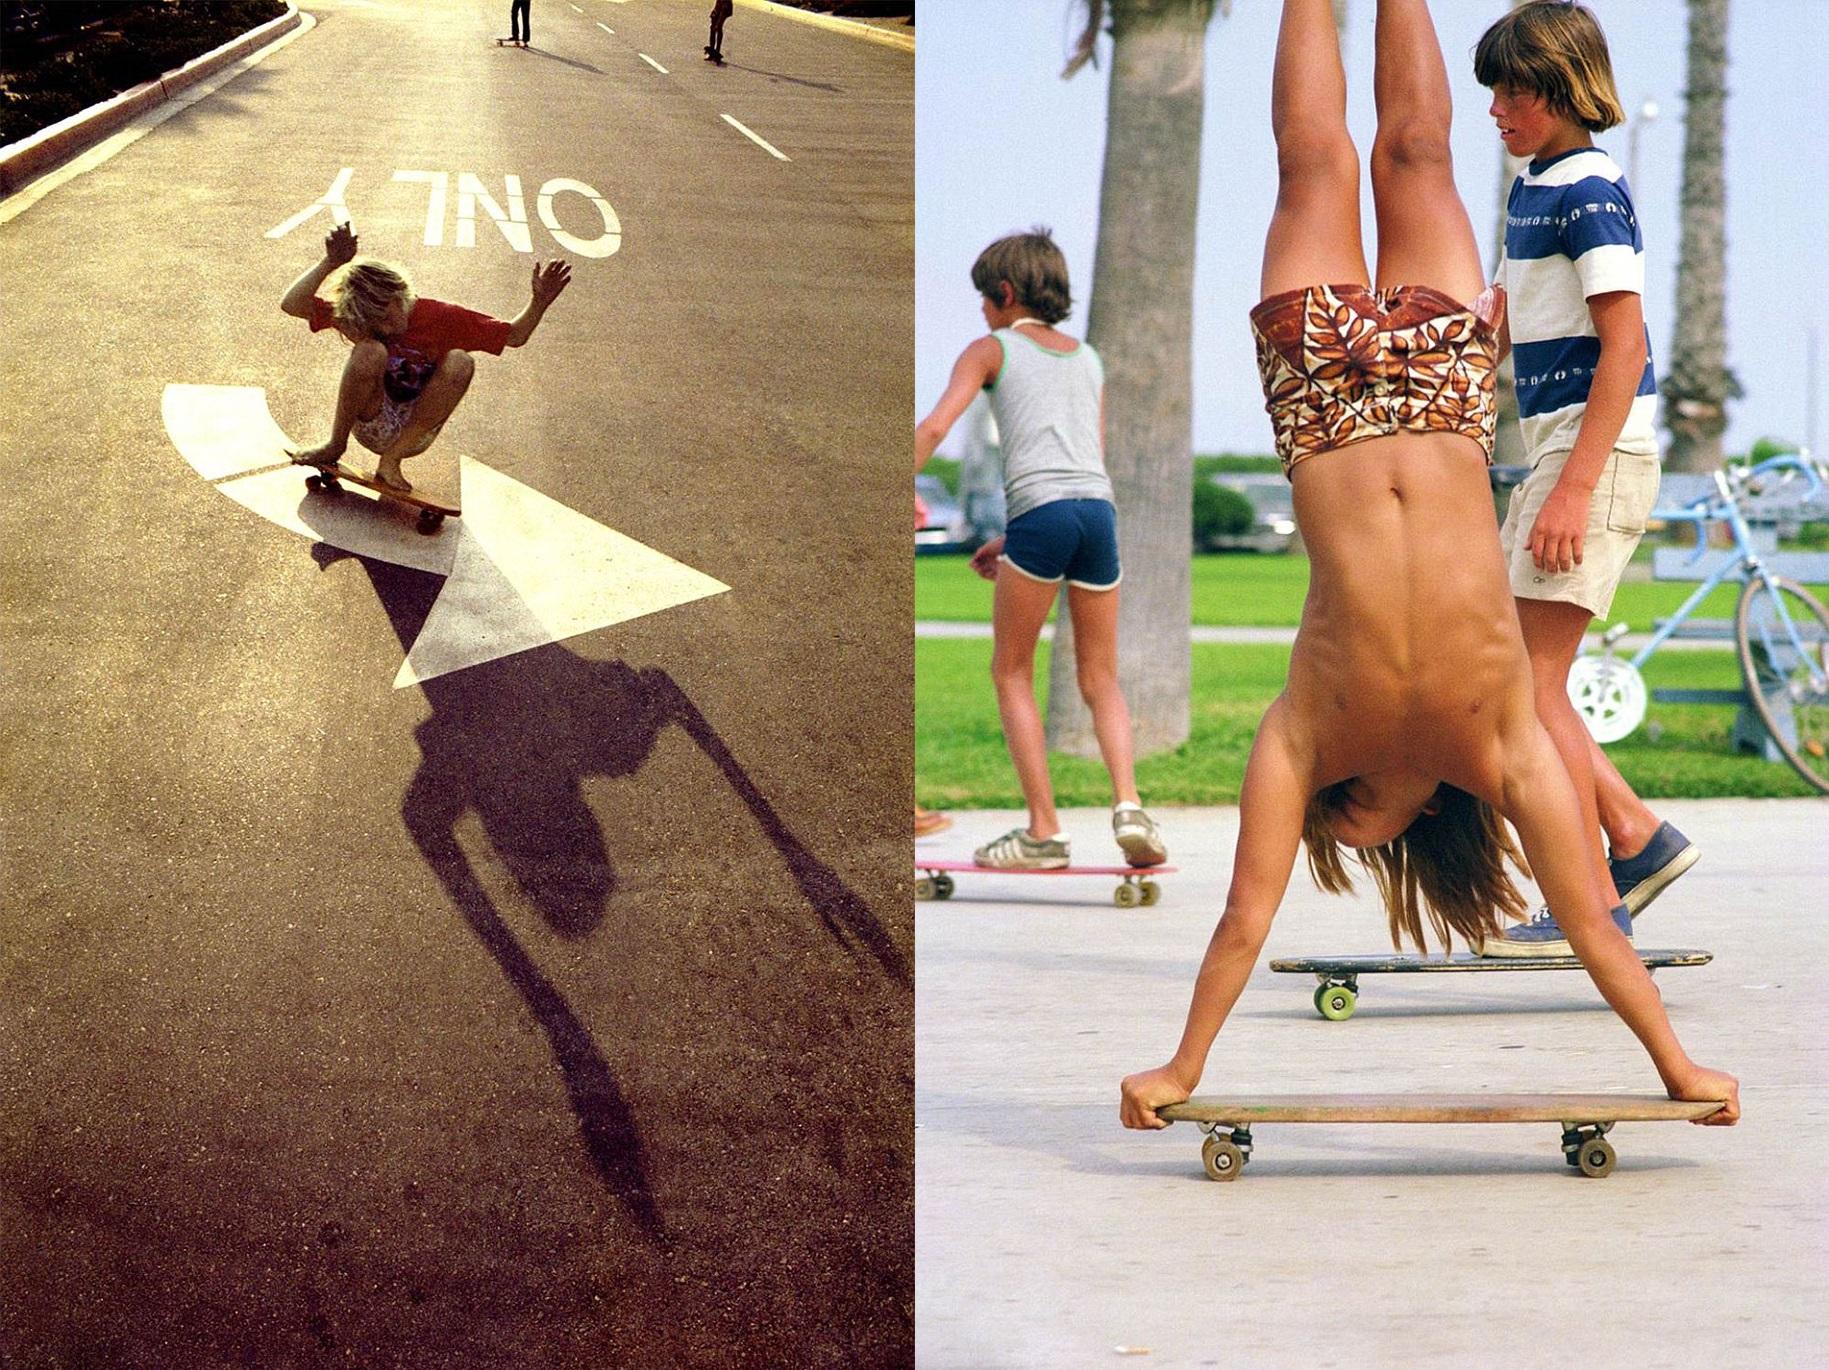 1970-California-skateboard-skater-kids-locals-only-hugh-holland-999 2